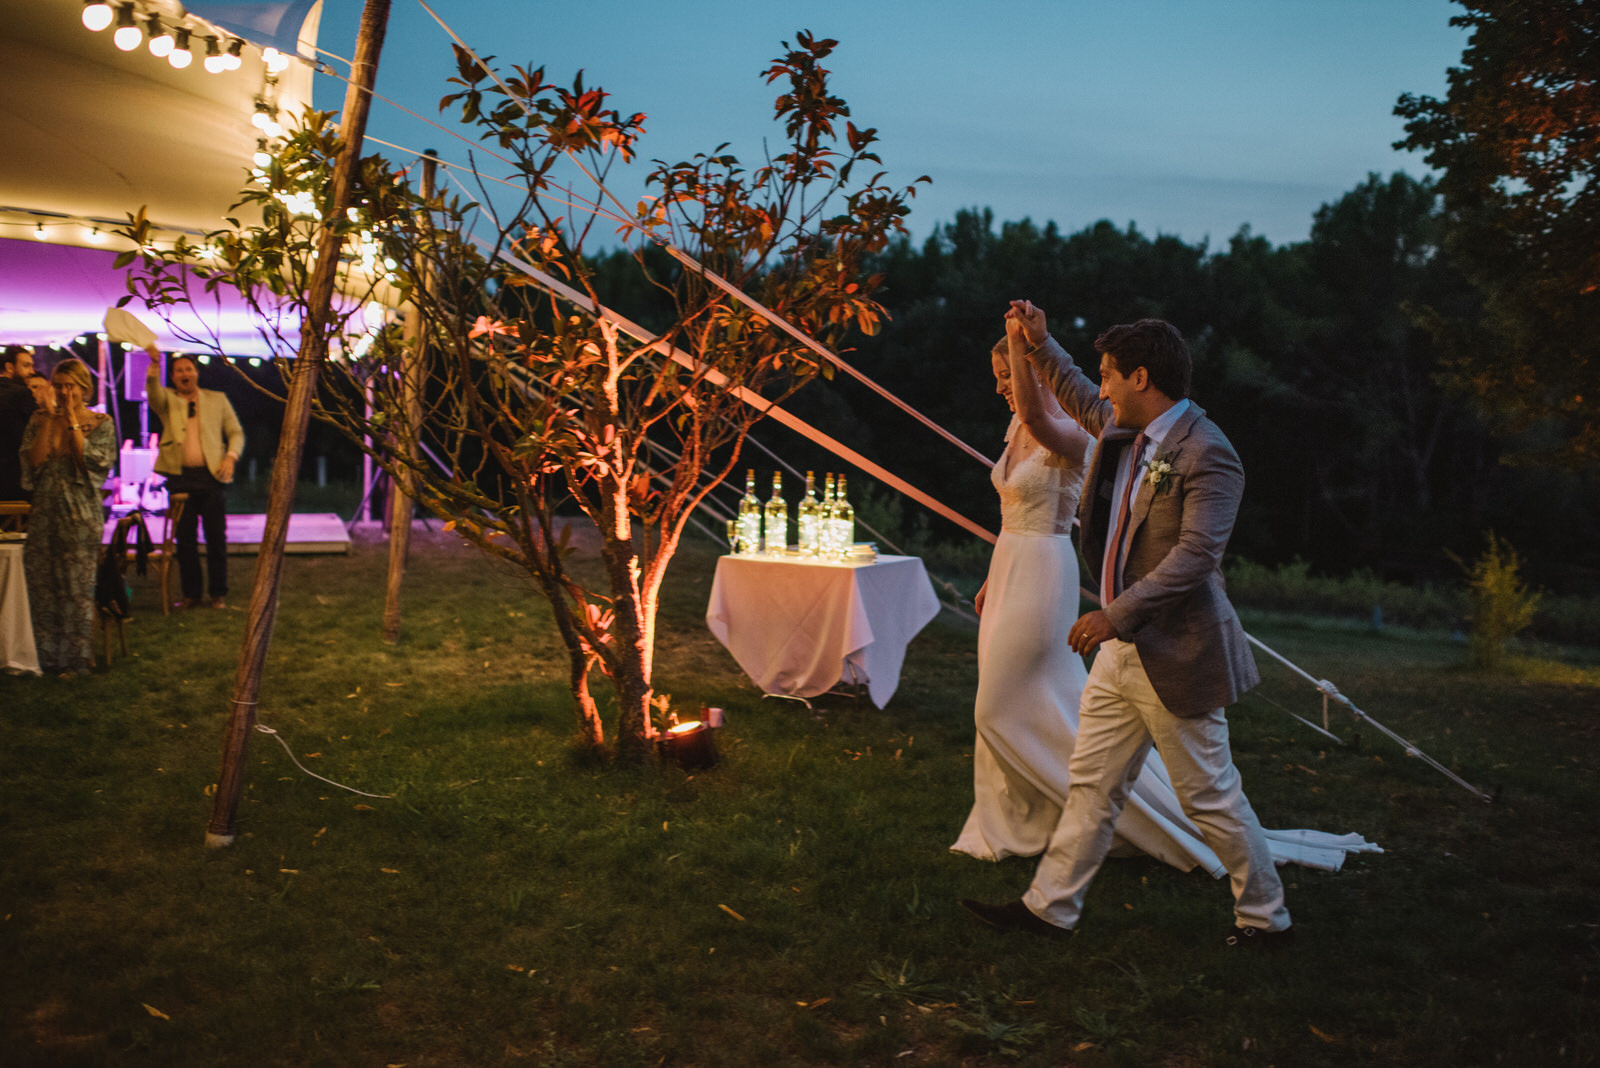 037-LOURMARIN-WEDDING-PHOTOGRAPHER-PROVENCE-WEDDING-ALTERNATIVE-WEDDING-PHOTOGRAPHY-FRANCE-PROVENCE-GARDEN-WEDDING.JPG